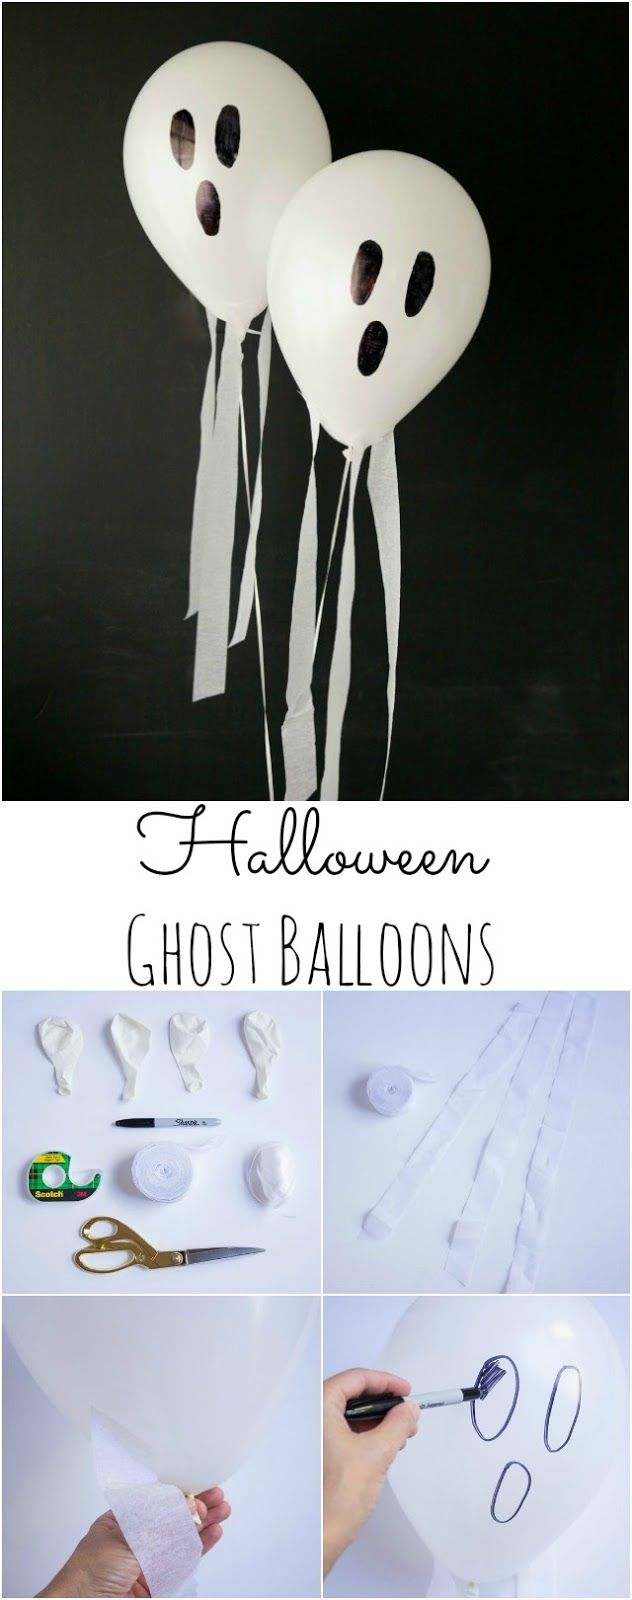 Halloween Ghost Balloons Halloween Diy Halloween Decorations